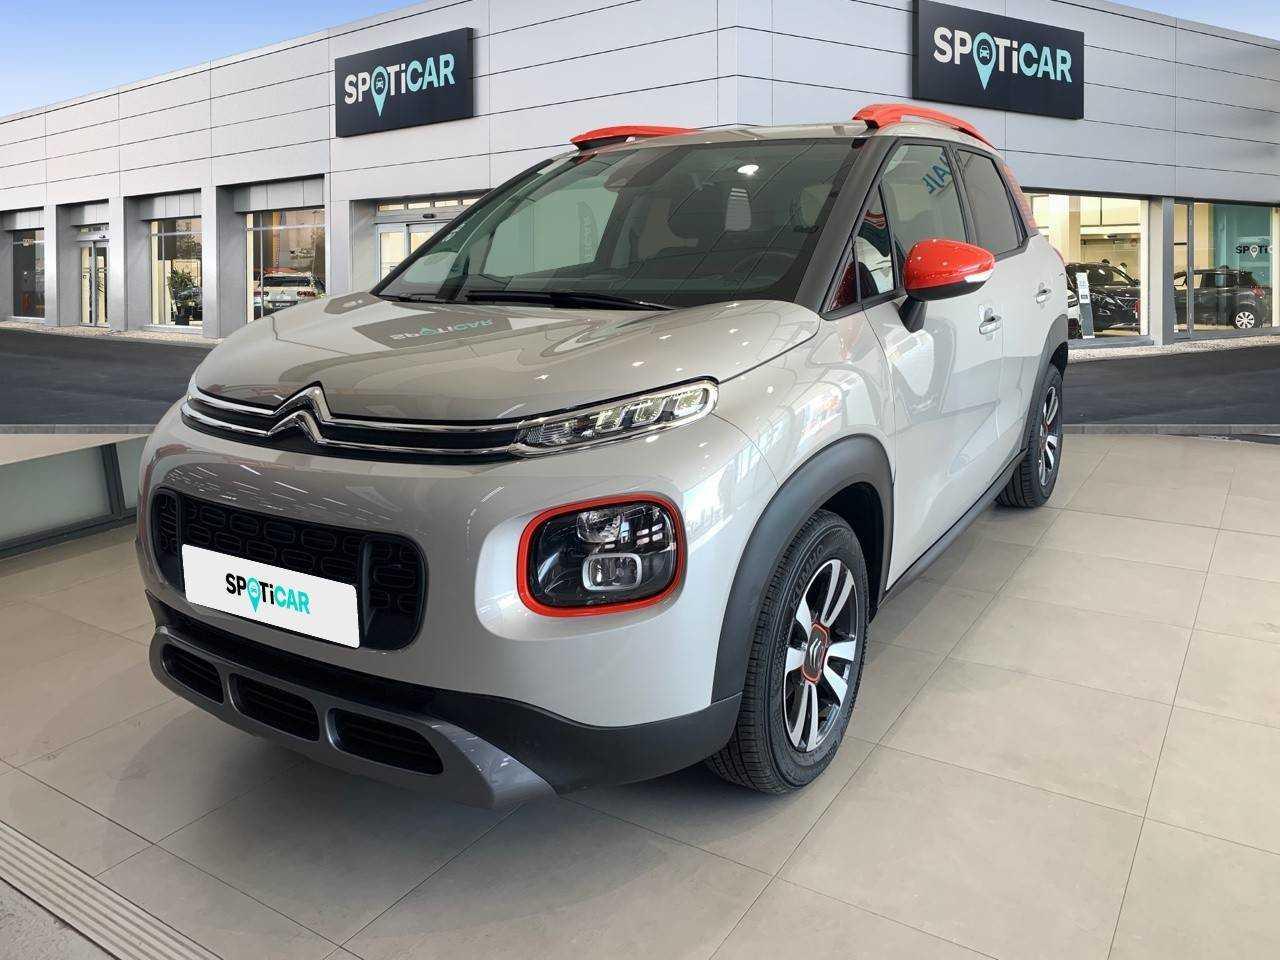 Citroën C3 Aircross ocasión segunda mano 2019 Diésel por 17.950€ en Madrid